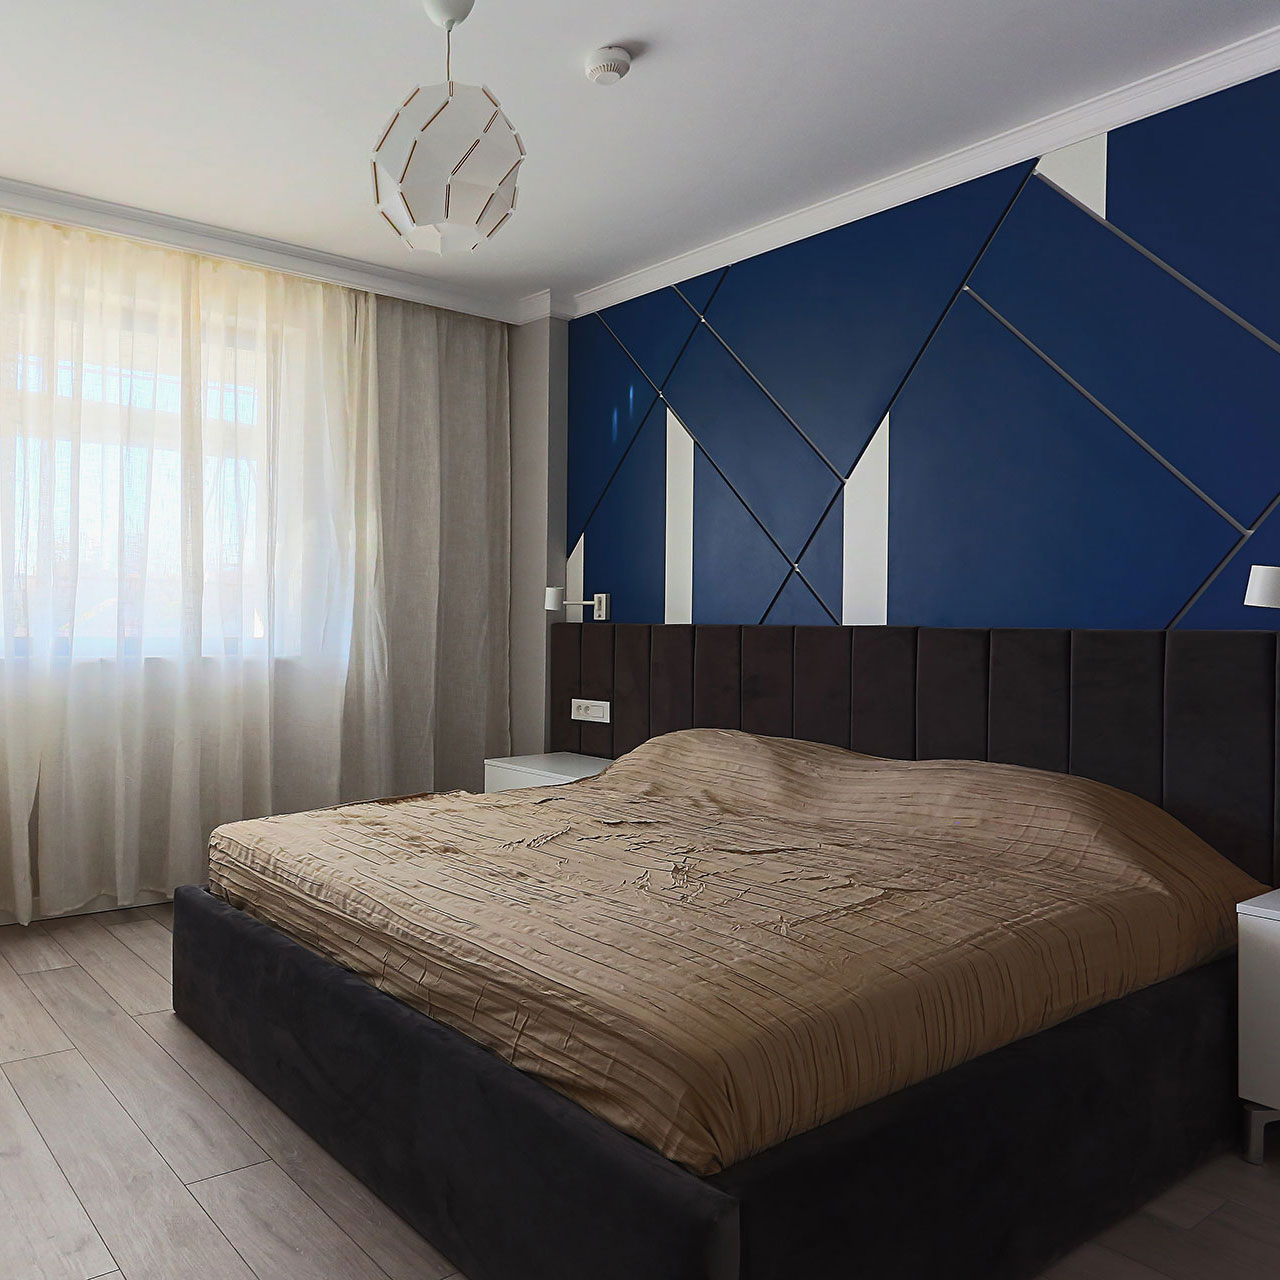 Apartamente de vanzare Bucuresti - Catedral Residence - Marriott, Piata Unirii, 13 Septembrie, Izvor - G1 - 5